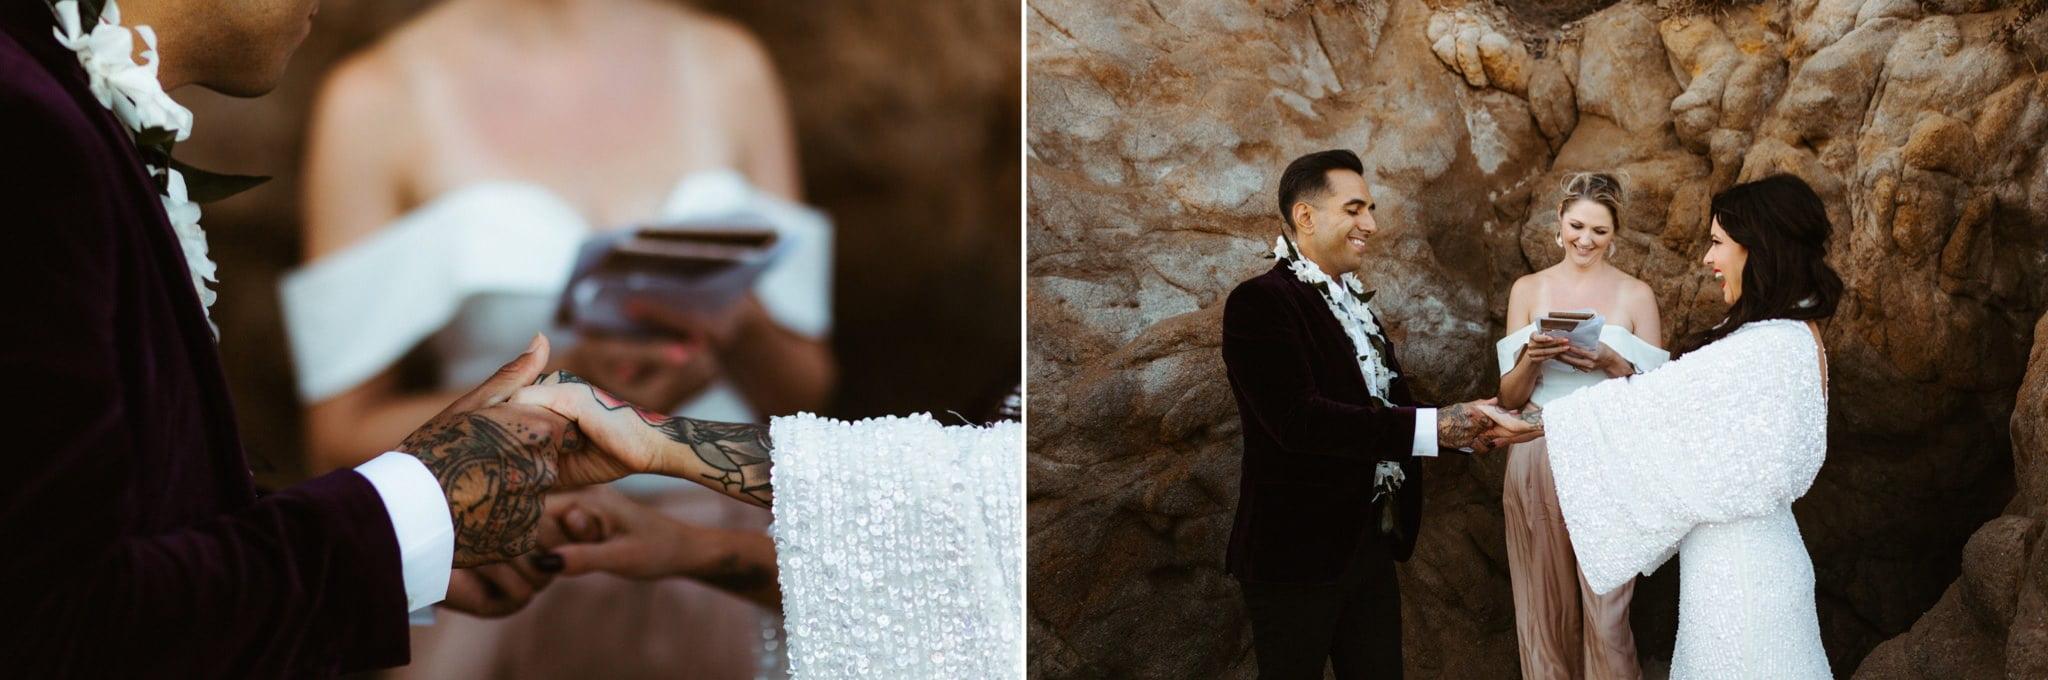 malibu elopement photographer 086